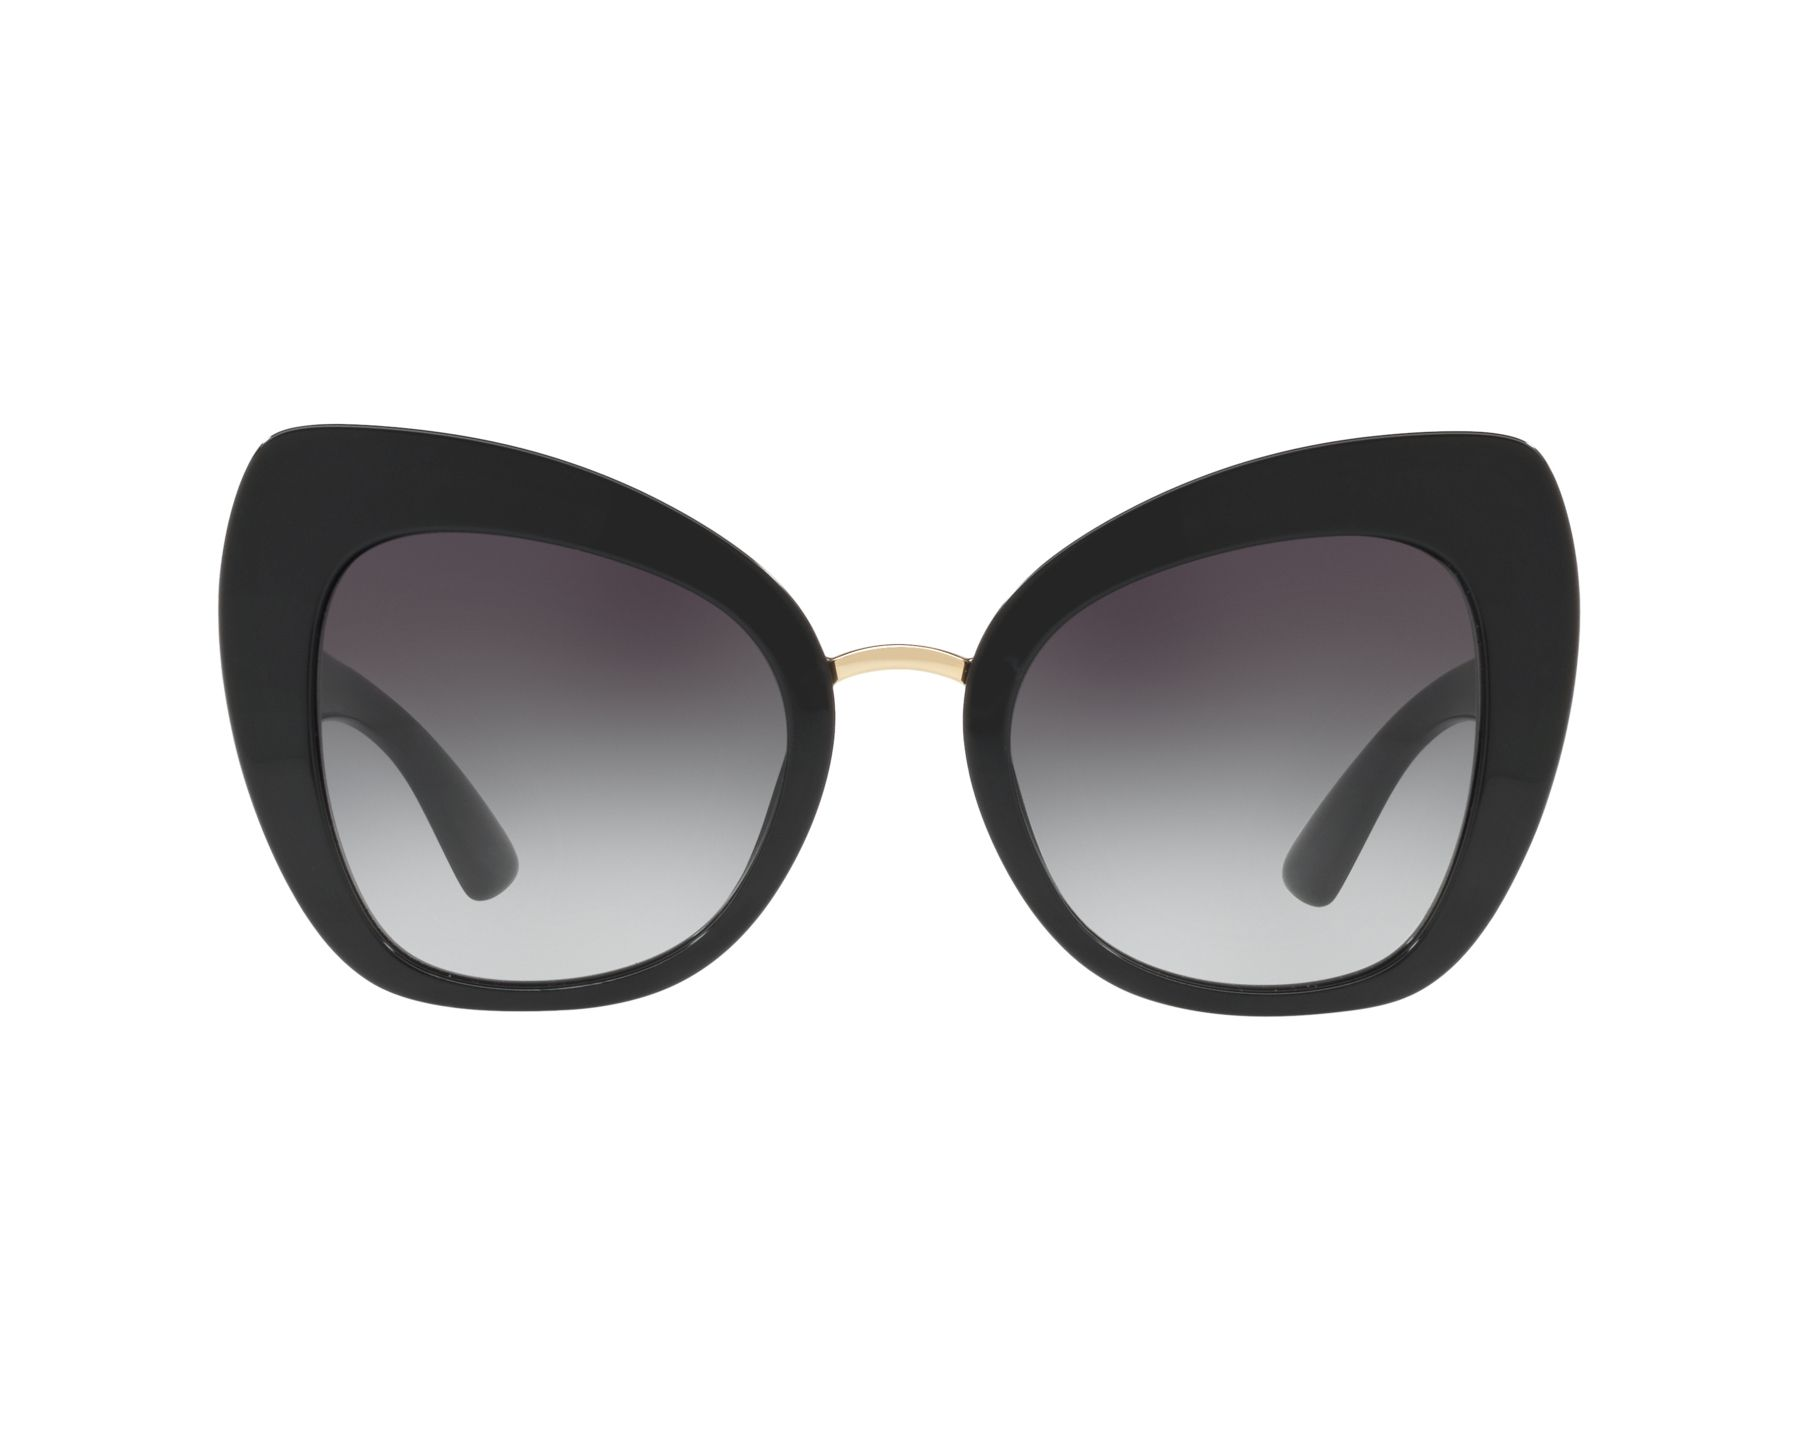 precio competitivo cf012 5ea11 Dolce & Gabbana DG-4319 501/8G